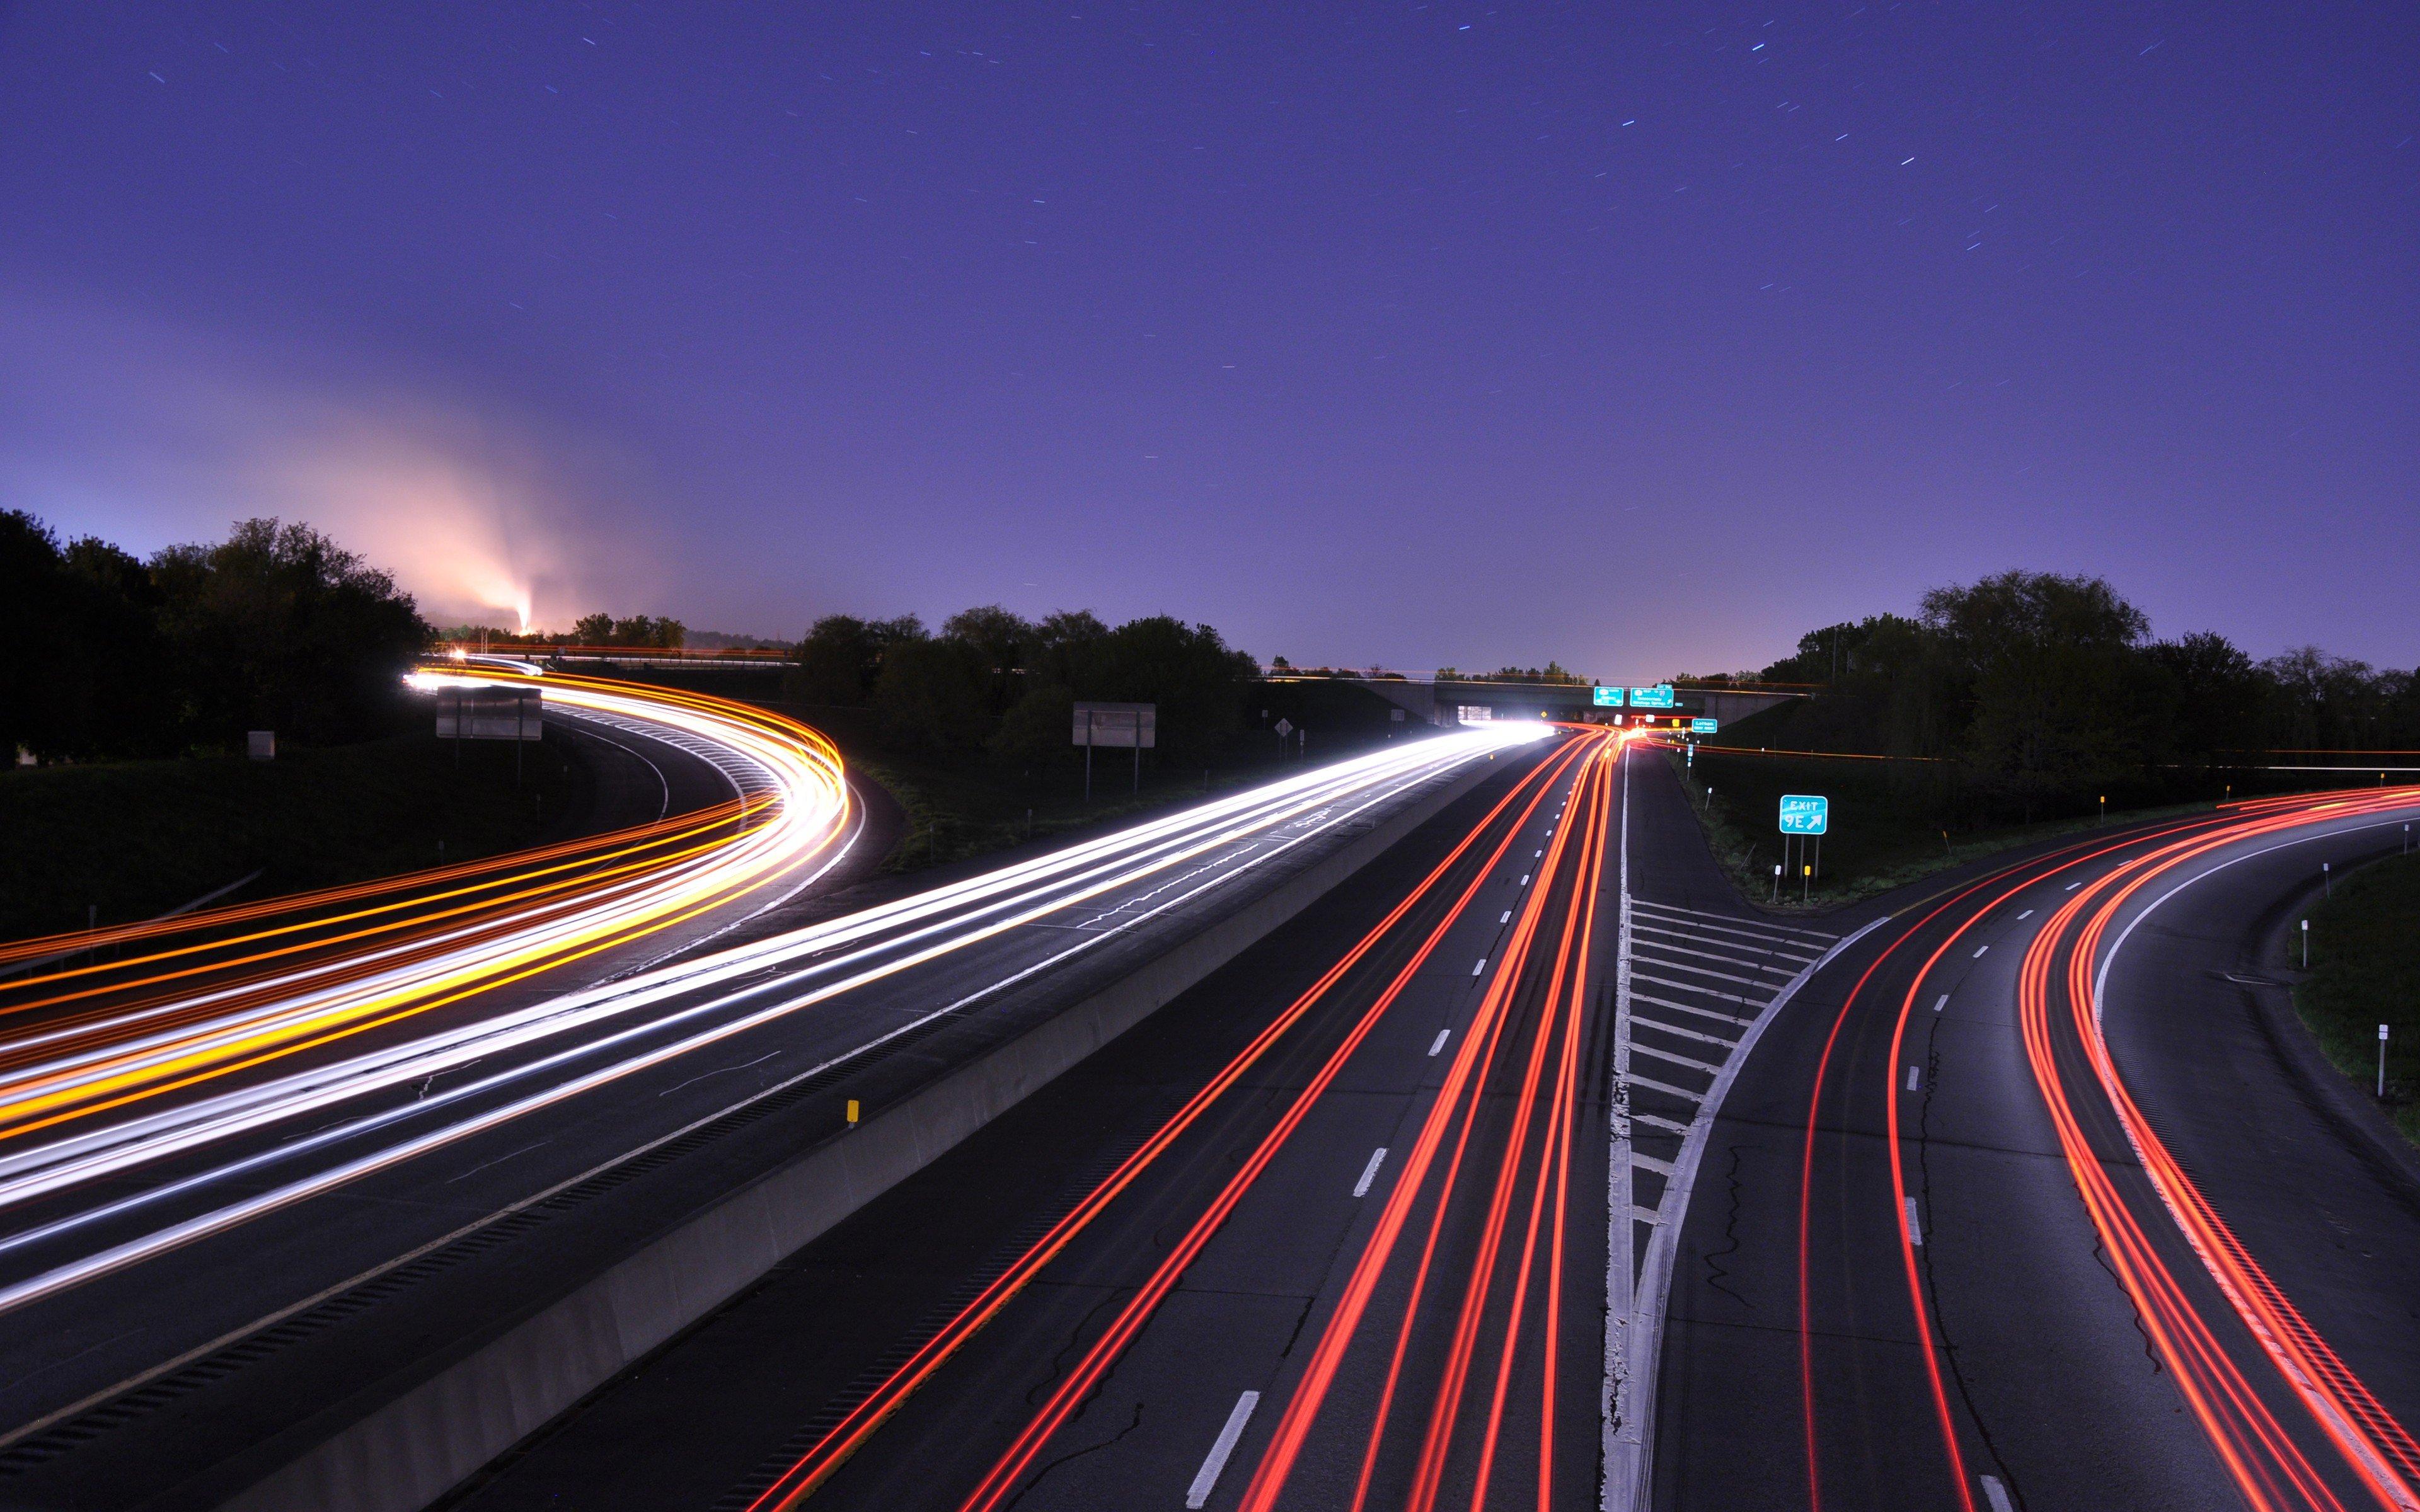 Wallpaper : 3840x2400 Px, Freeway, Lights, Long Exposure